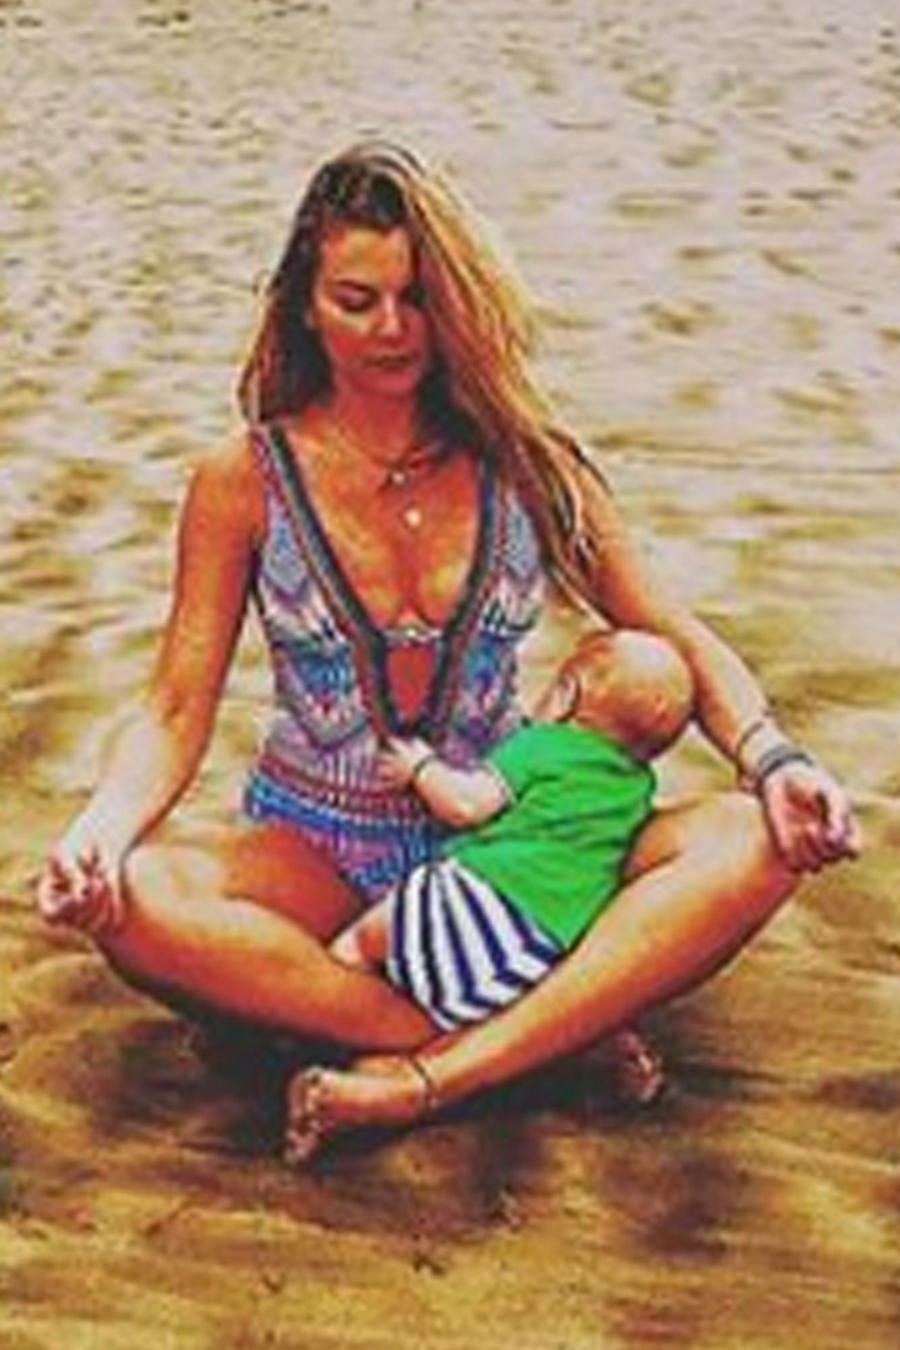 Marjorie de Sousa hace reír a carcajadas a su bebé